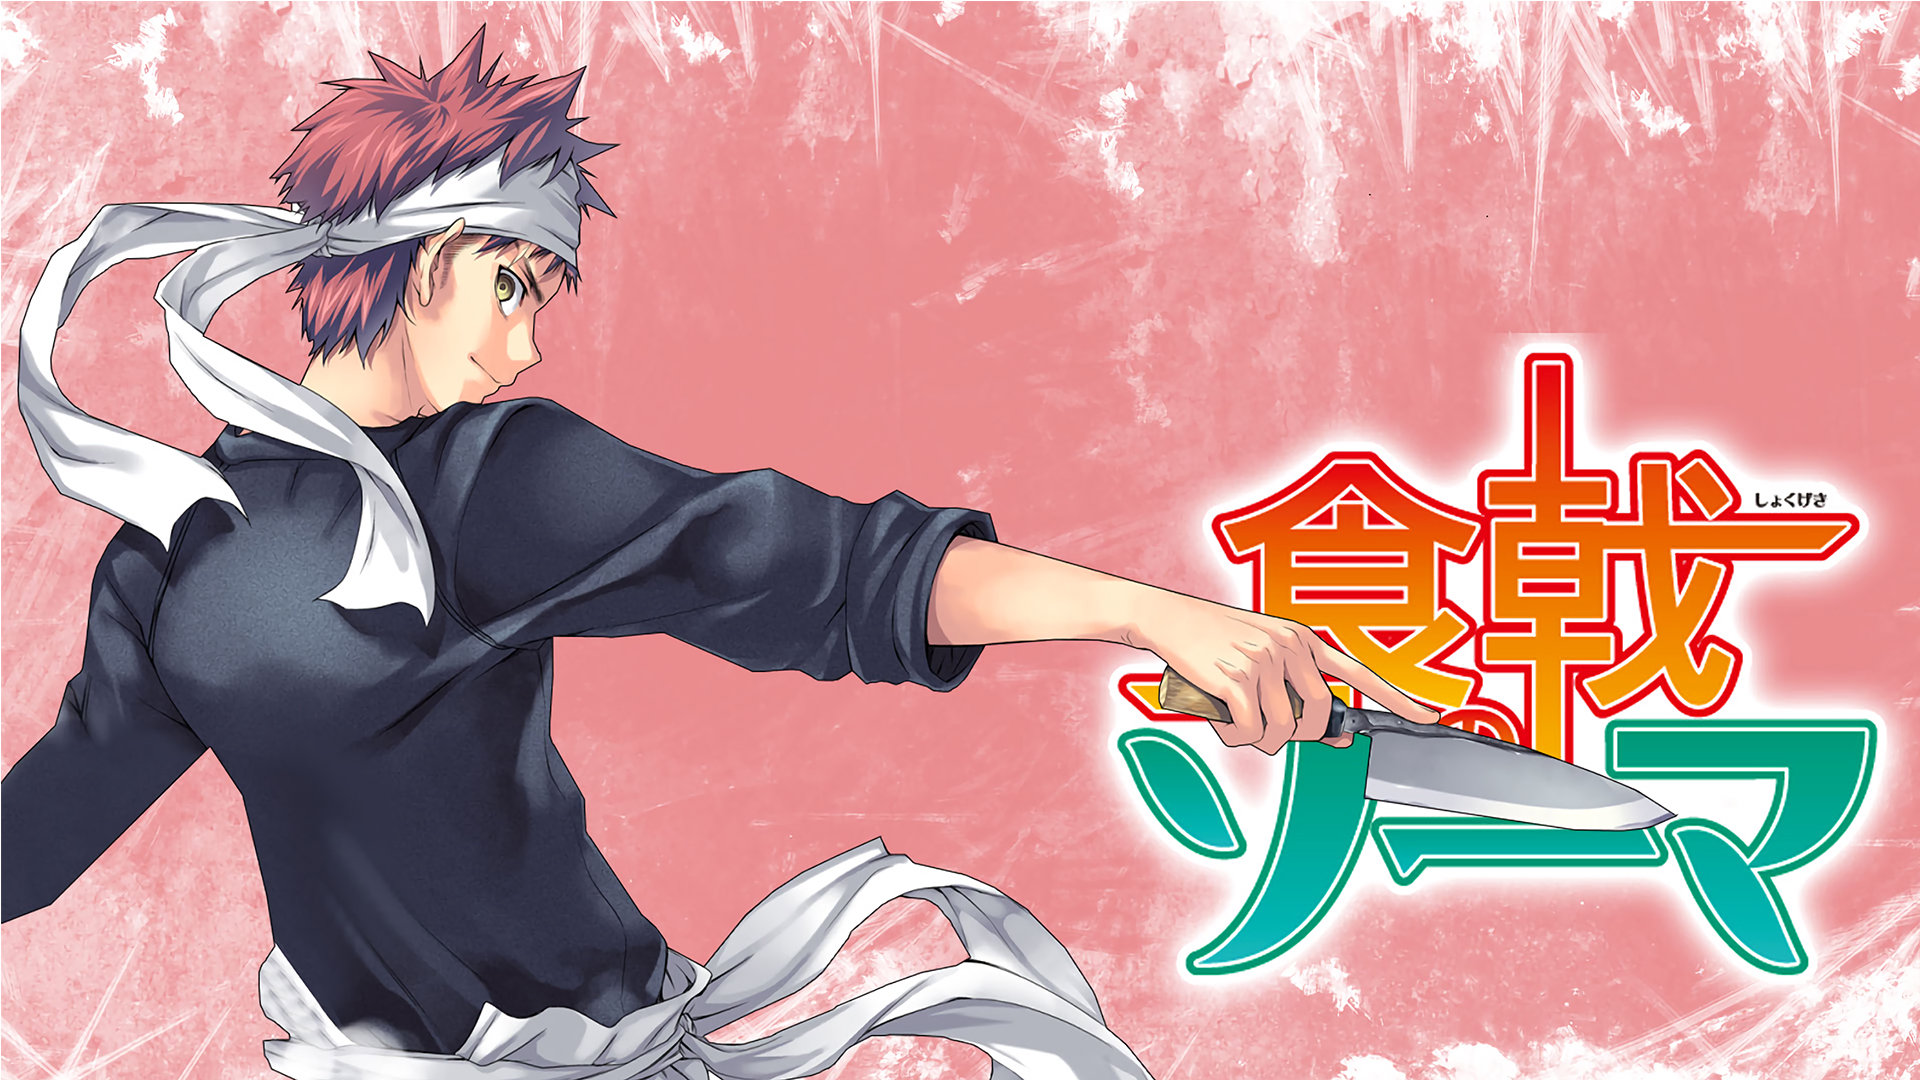 Food Wars: Shokugeki No Soma Wallpapers, Pictures, Images